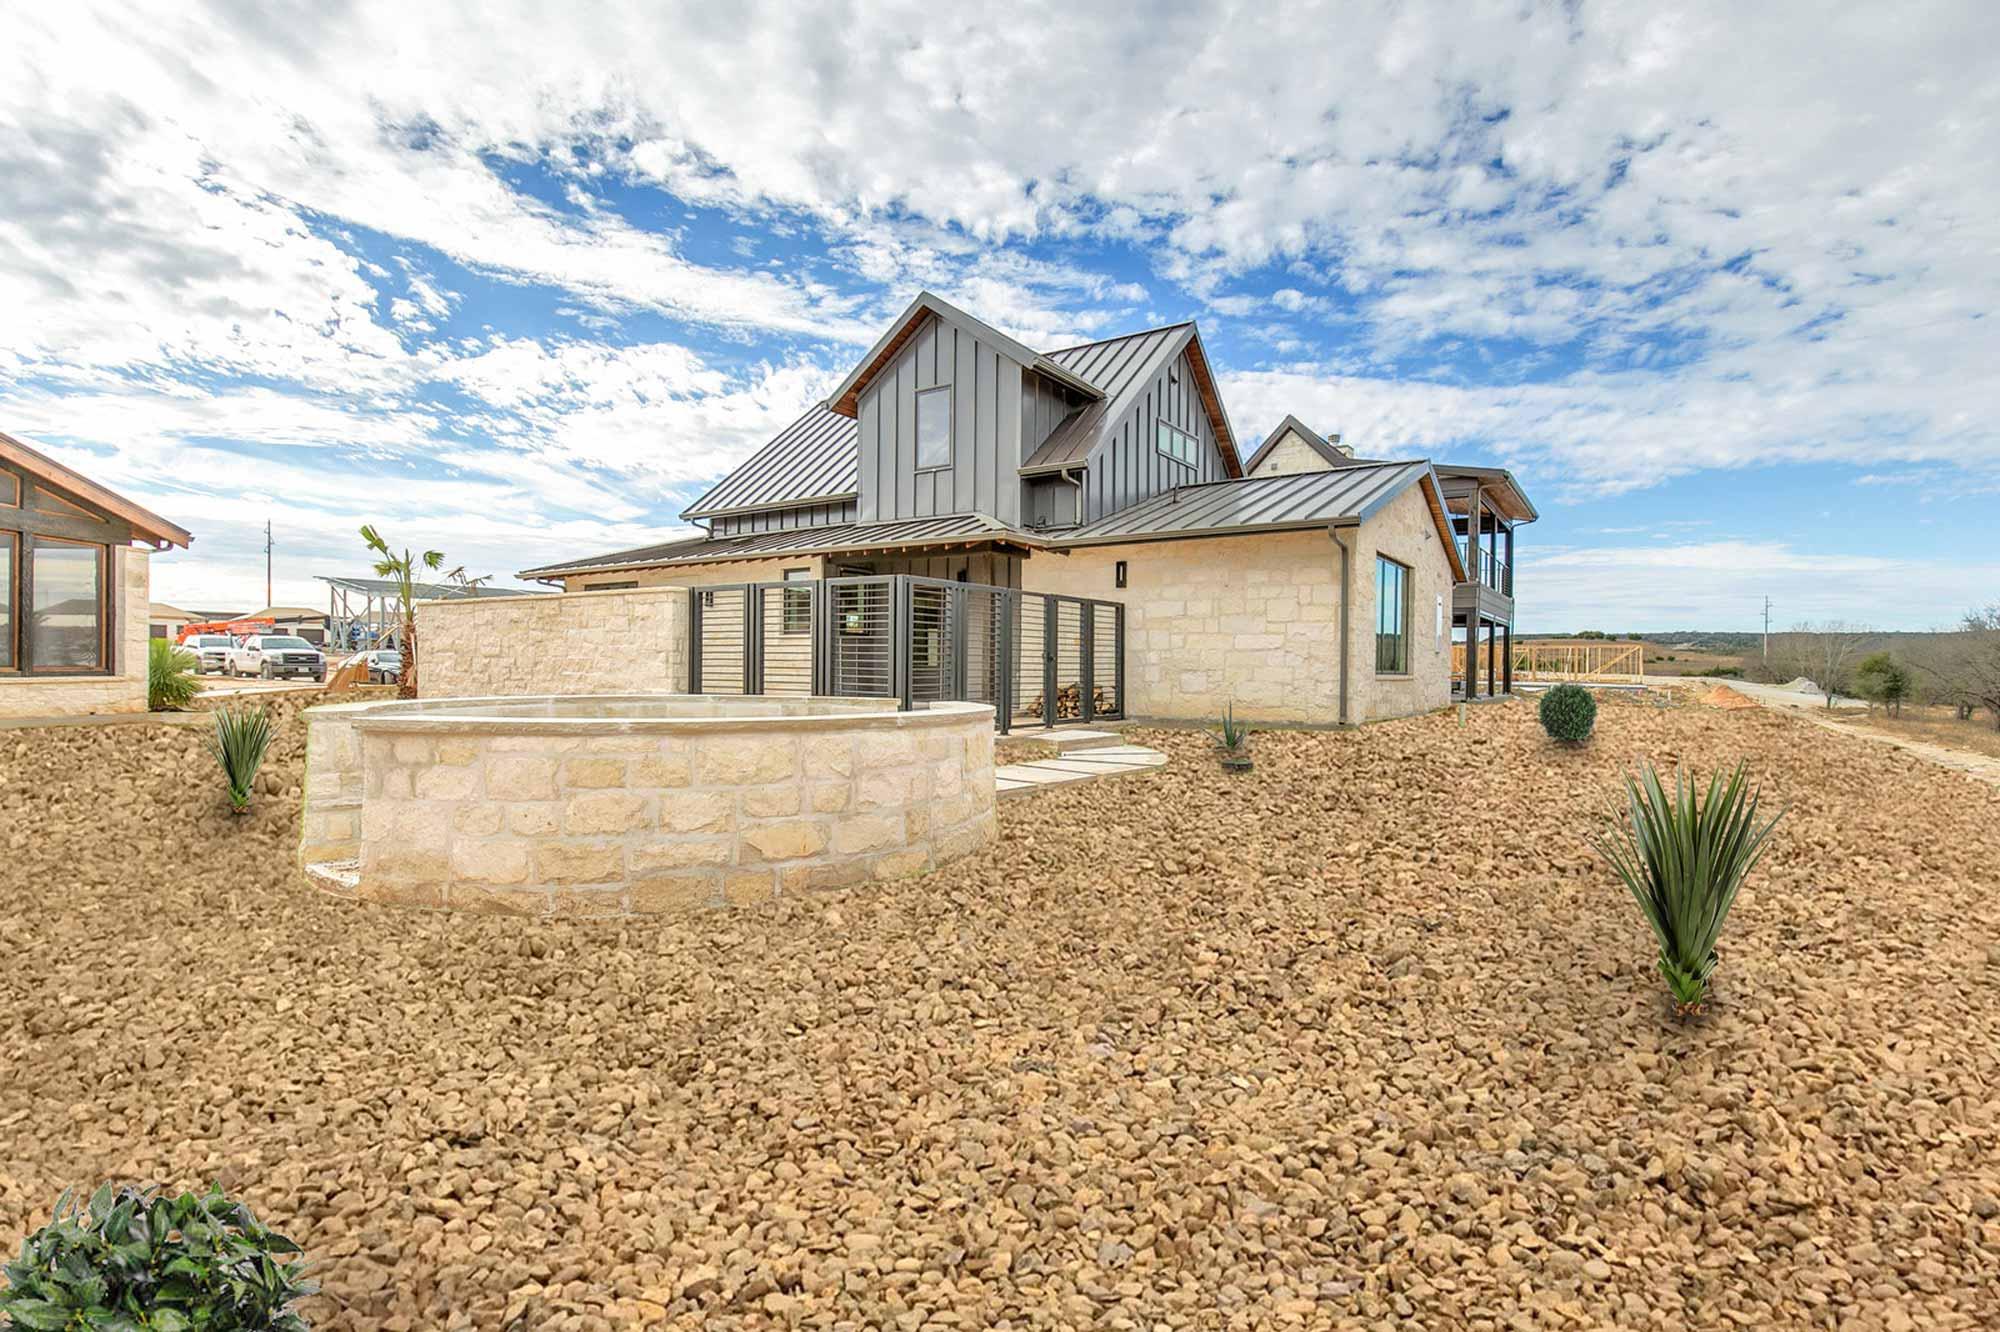 Steve-Bumpas-Custom-Homes-The-Residences-at-Rough-Creek-Lodge-The-Lynn-Lot-15-24-Luxury-Vacation-Homes-for-Sale-at-Rough-Creek-Lodge.jpg